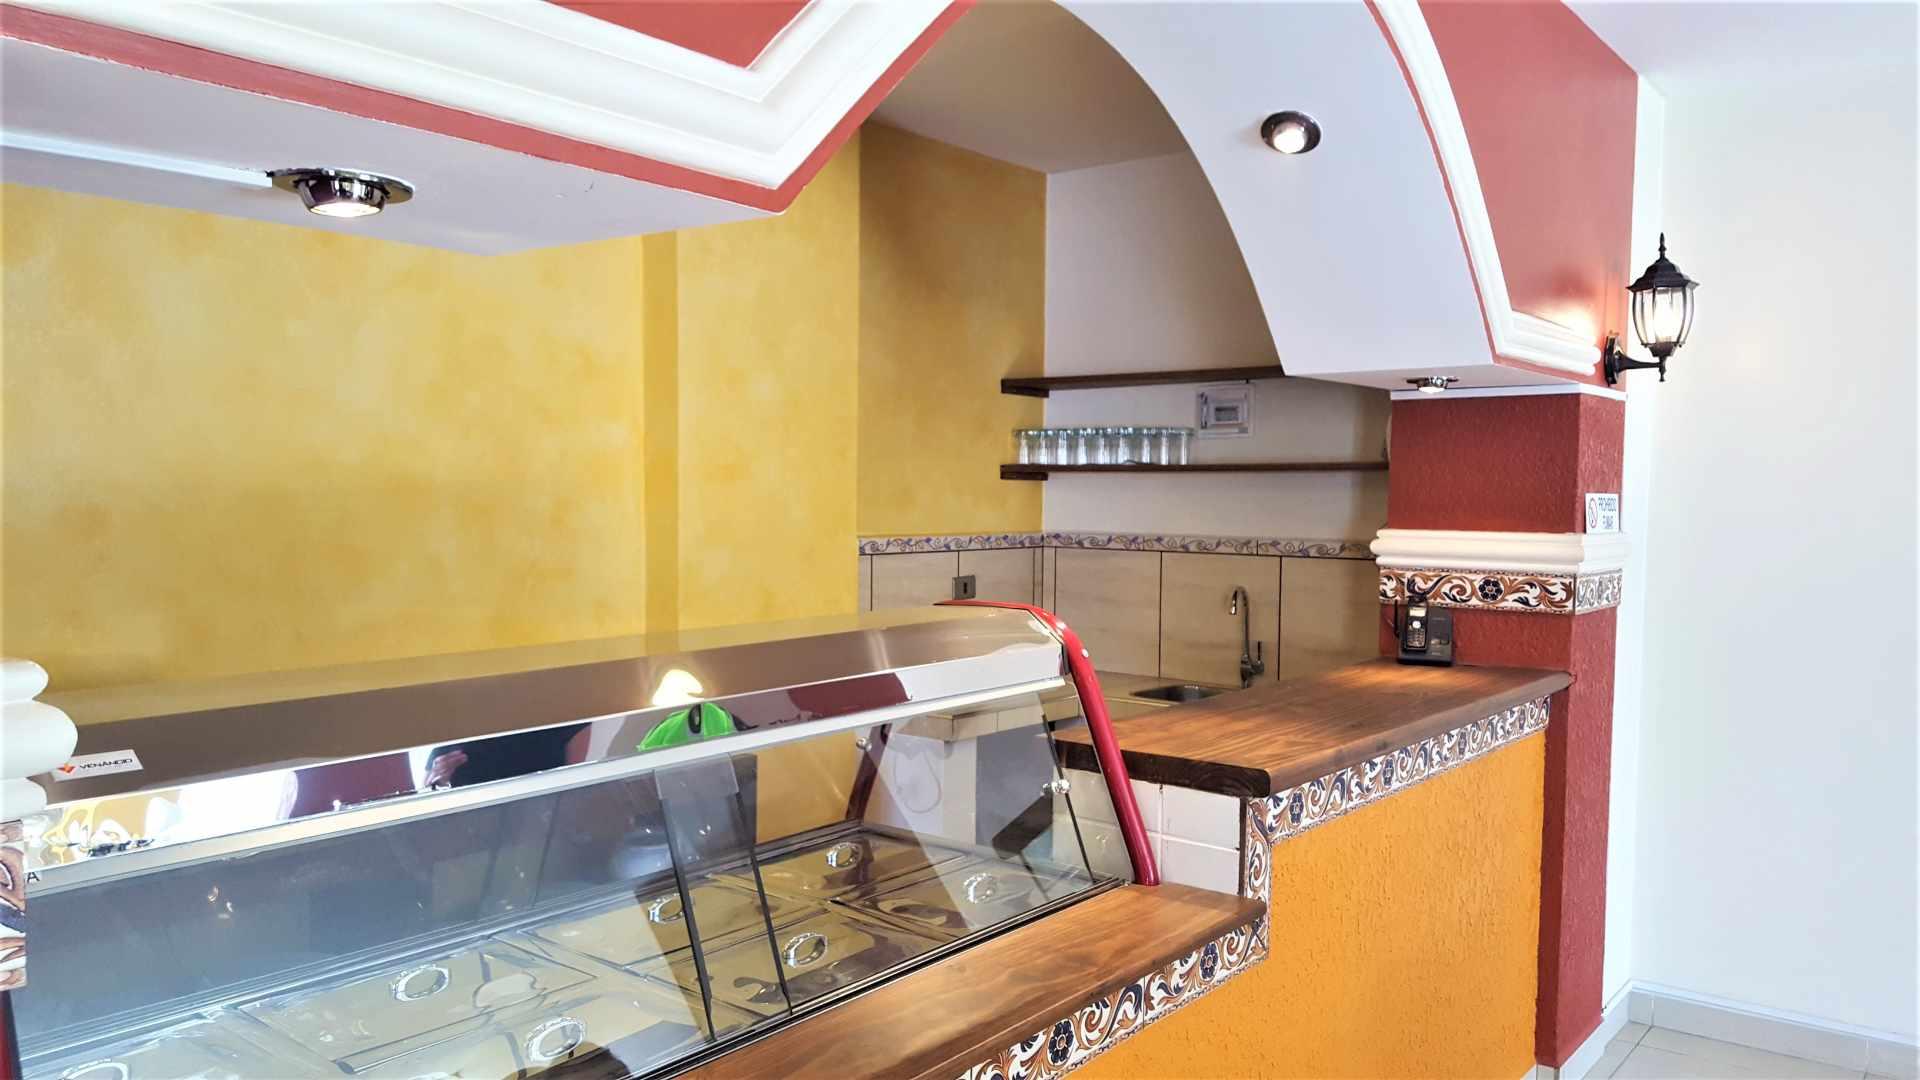 Local comercial en Venta $us 82.000.- LOCAL COMERCIAL IDEAL PARA RESTAURANTE - ZONA CALA CALA. CEL.: 799-98200 Foto 3